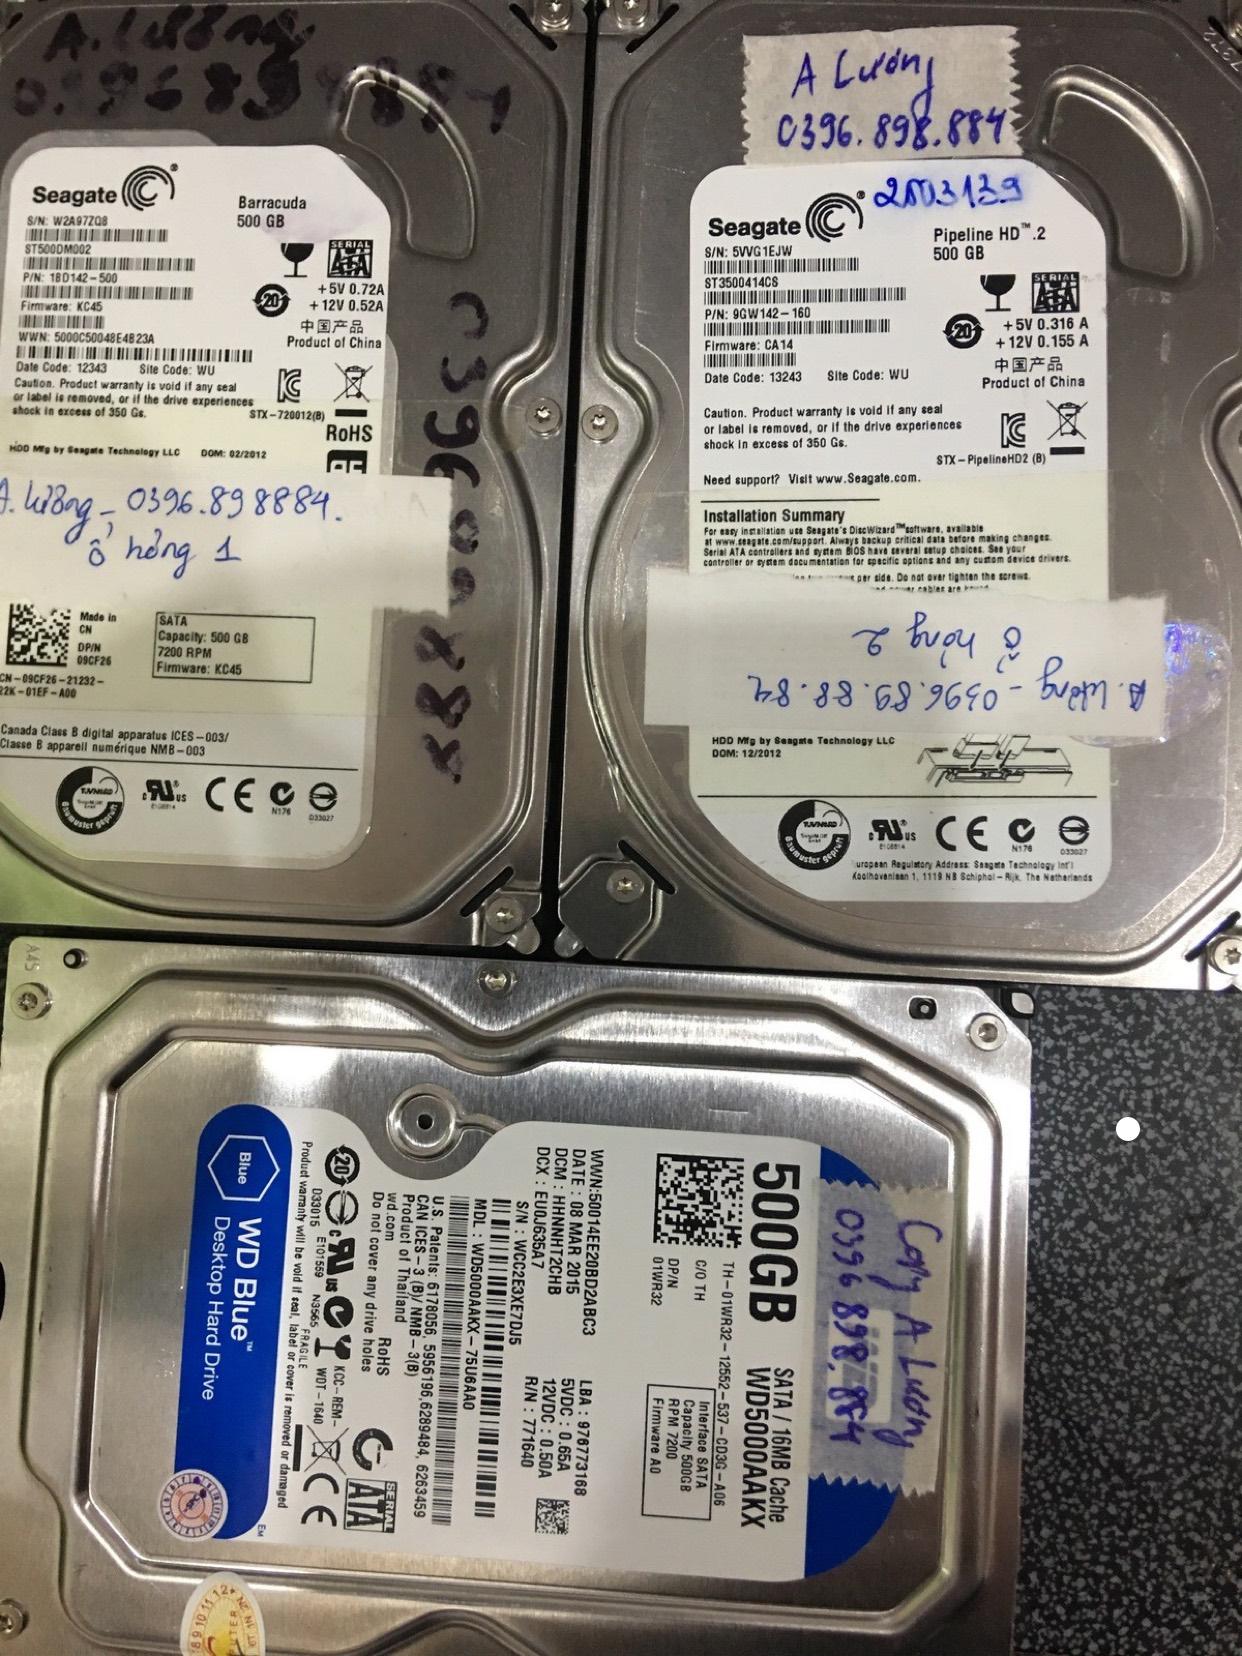 Phục hồi dữ liệu ổ cứng Seagate 500GB lỗi cơ 20/05/2020 - cuumaytinh